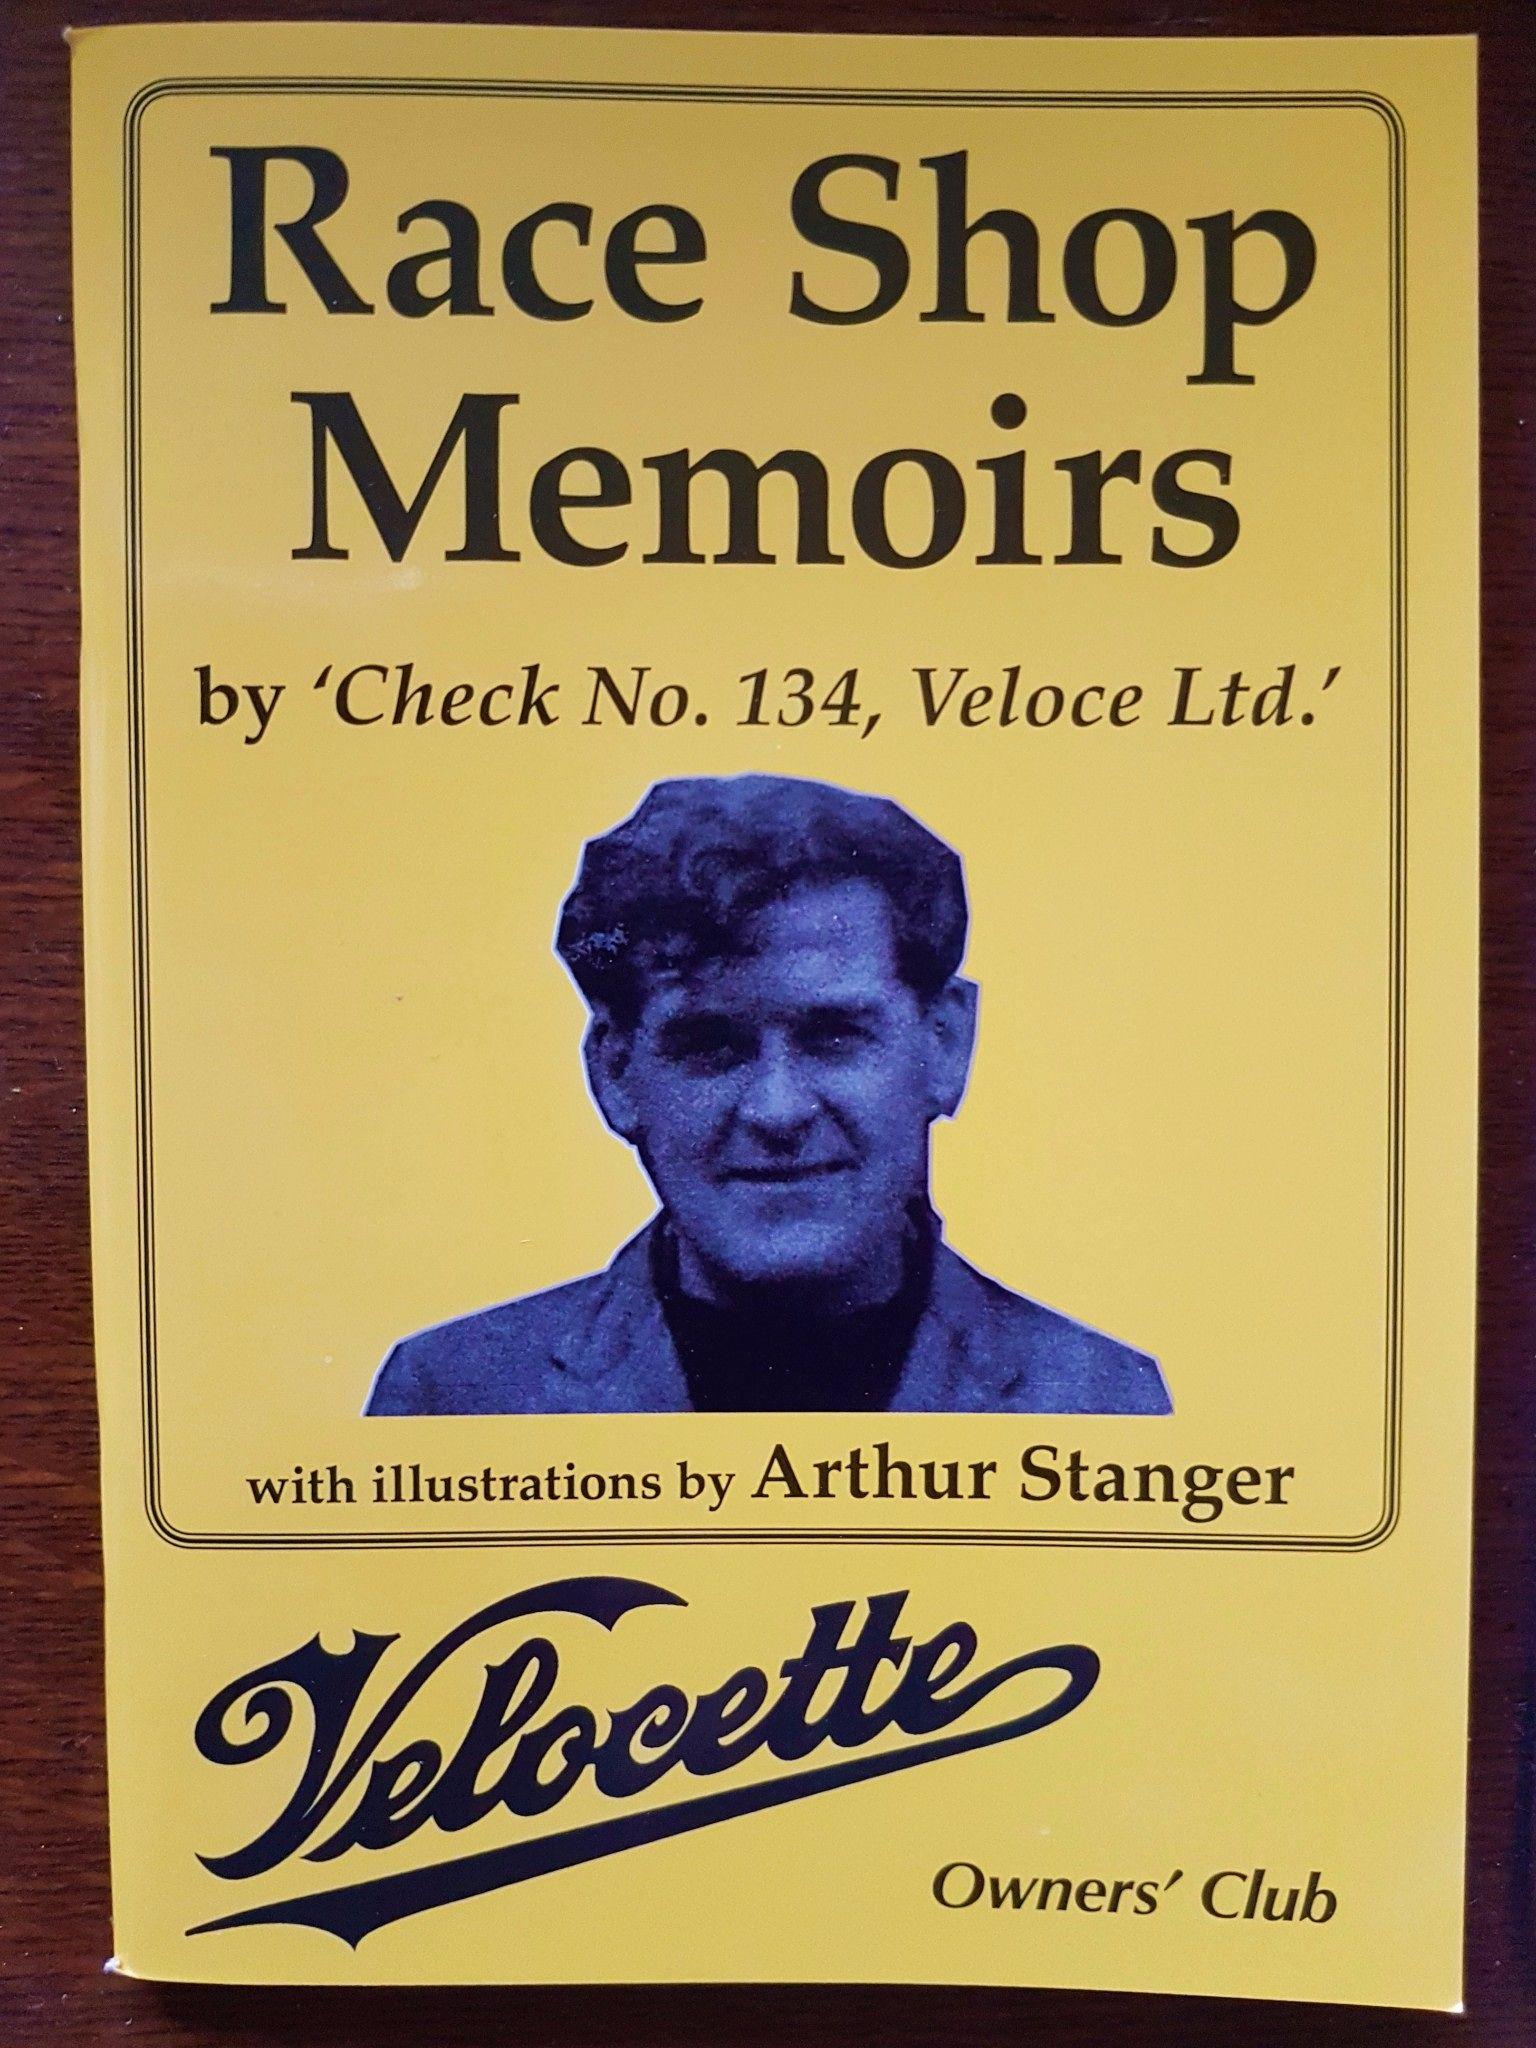 Race Shop Memoirs and 1928 Brochure reprint